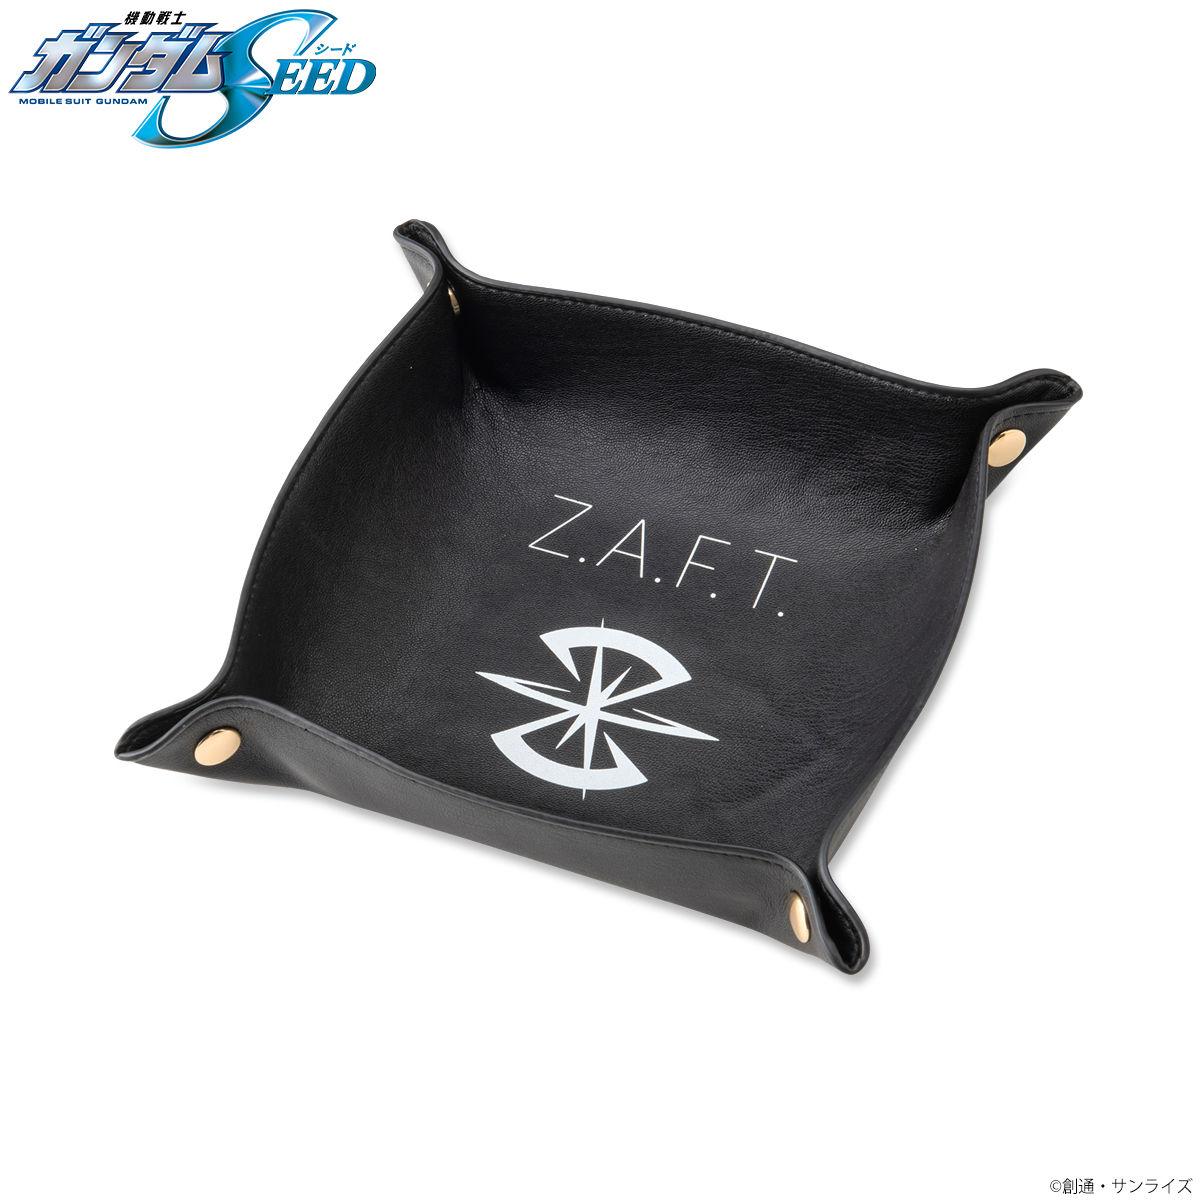 Mobile Suit Gundam SEED ZAFT's Emblem Tray